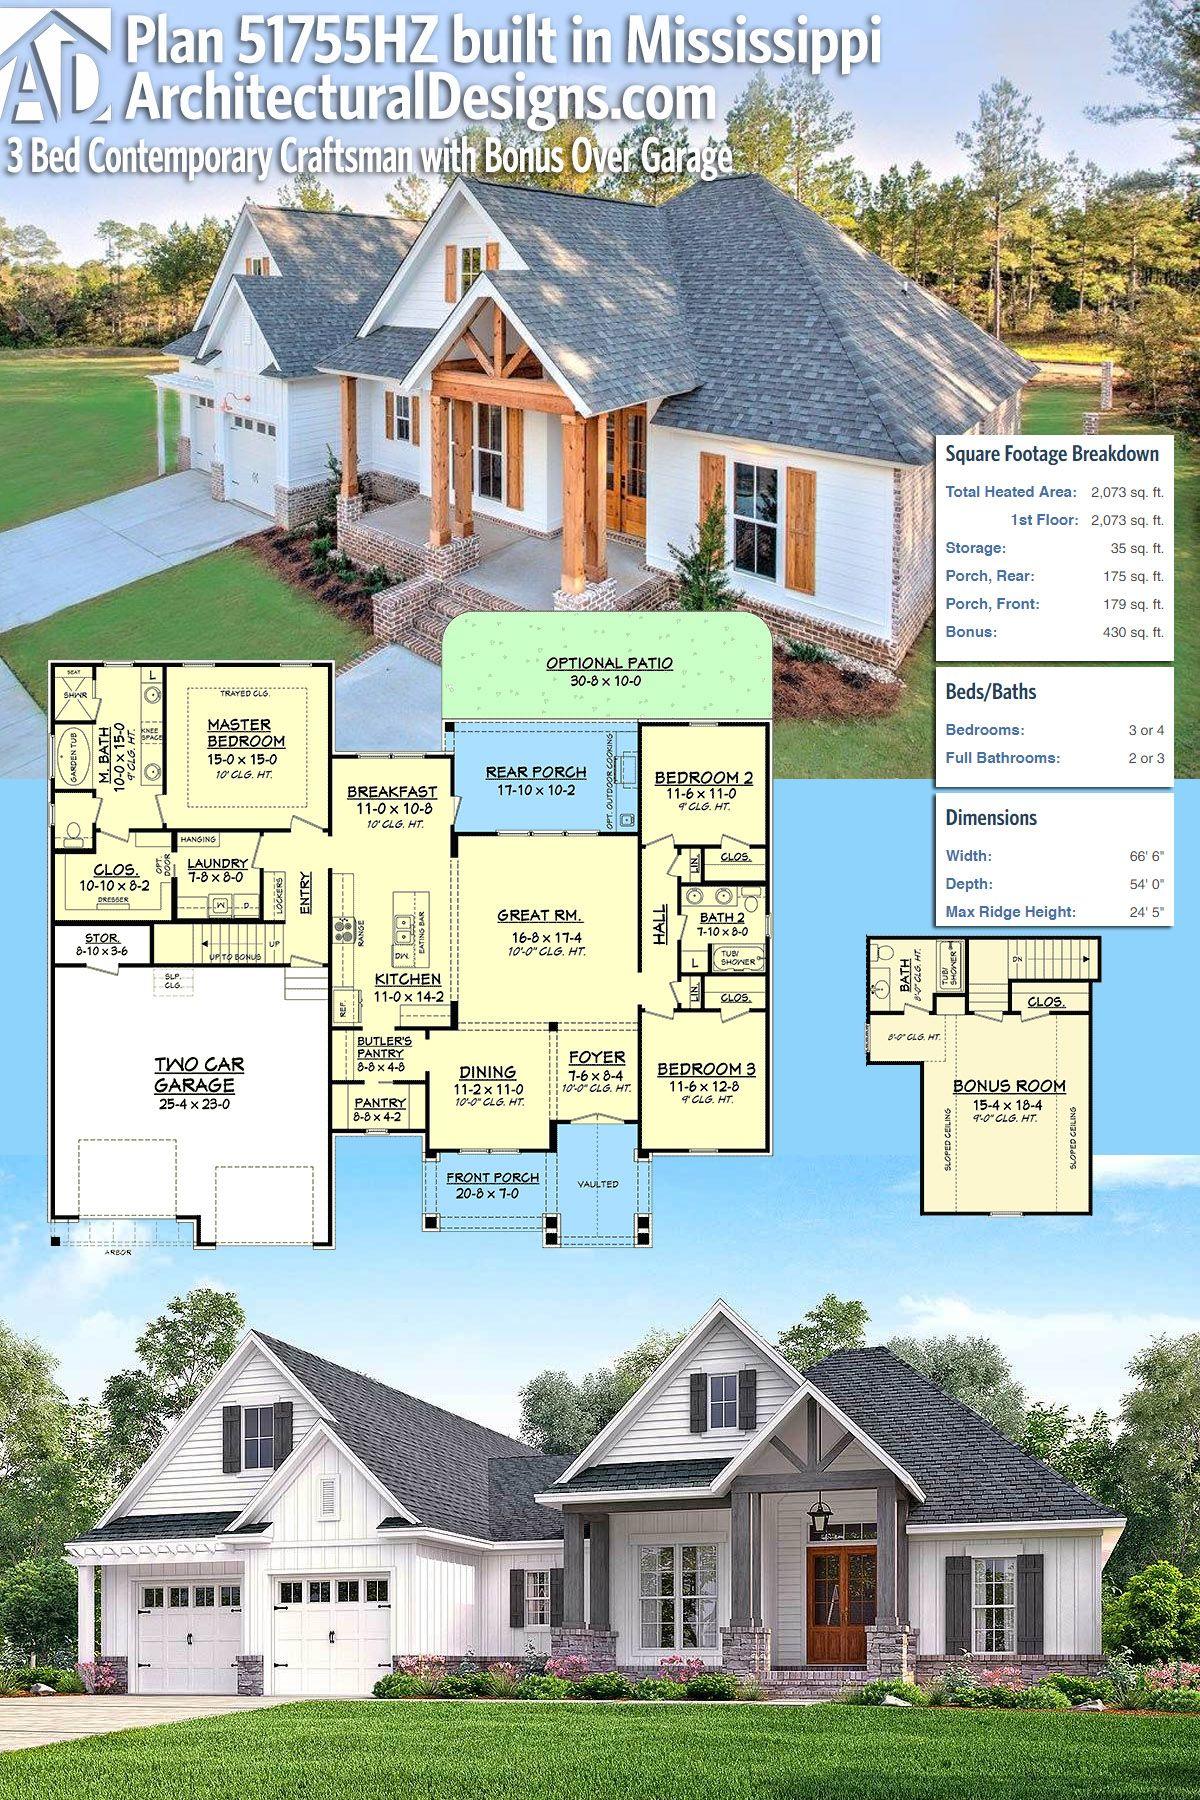 817433c2ef2cc38ba032ef91c270eba2 Top Result 52 Best Of Craftsman Style Home Plans Photography 2017 Hdj5